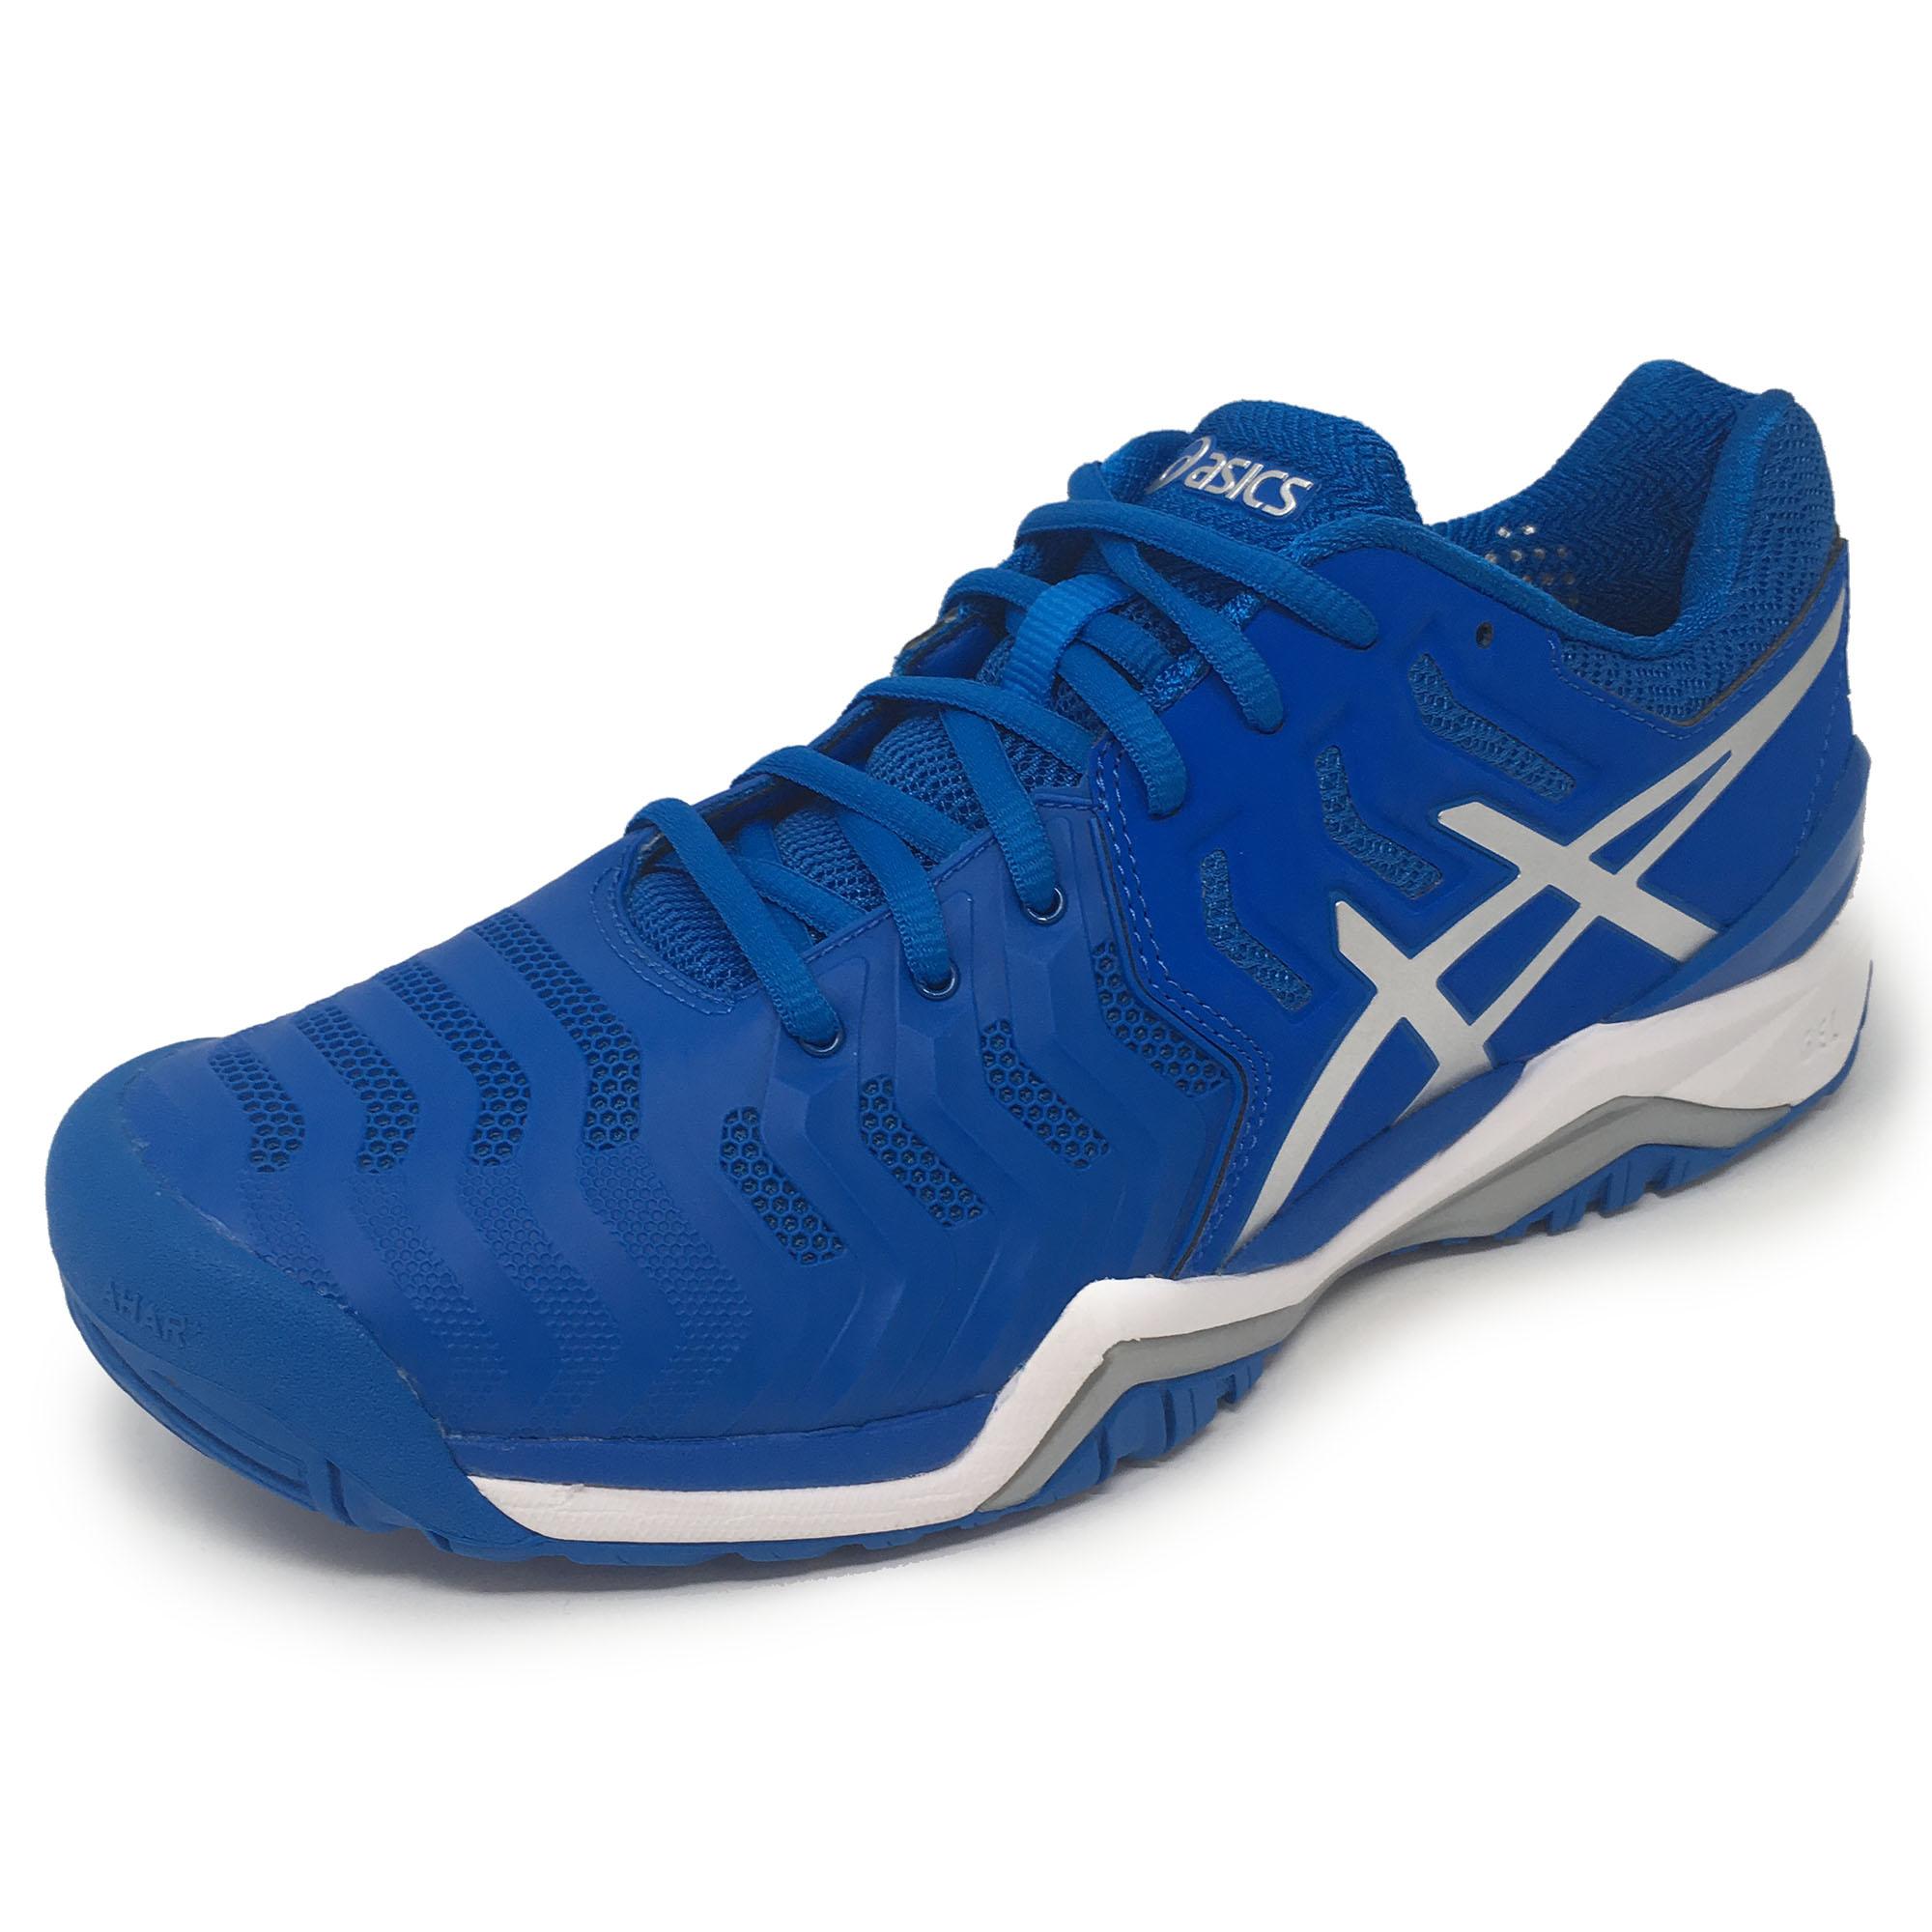 Asics GelResolution 7 Mens Tennis Shoes  Blue 10.5 UK